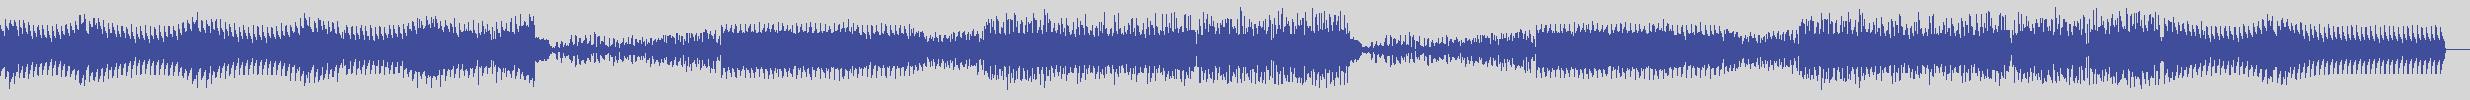 just_digital_records [JS1249] Roberto Bussi - Star [Original Mix] audio wave form